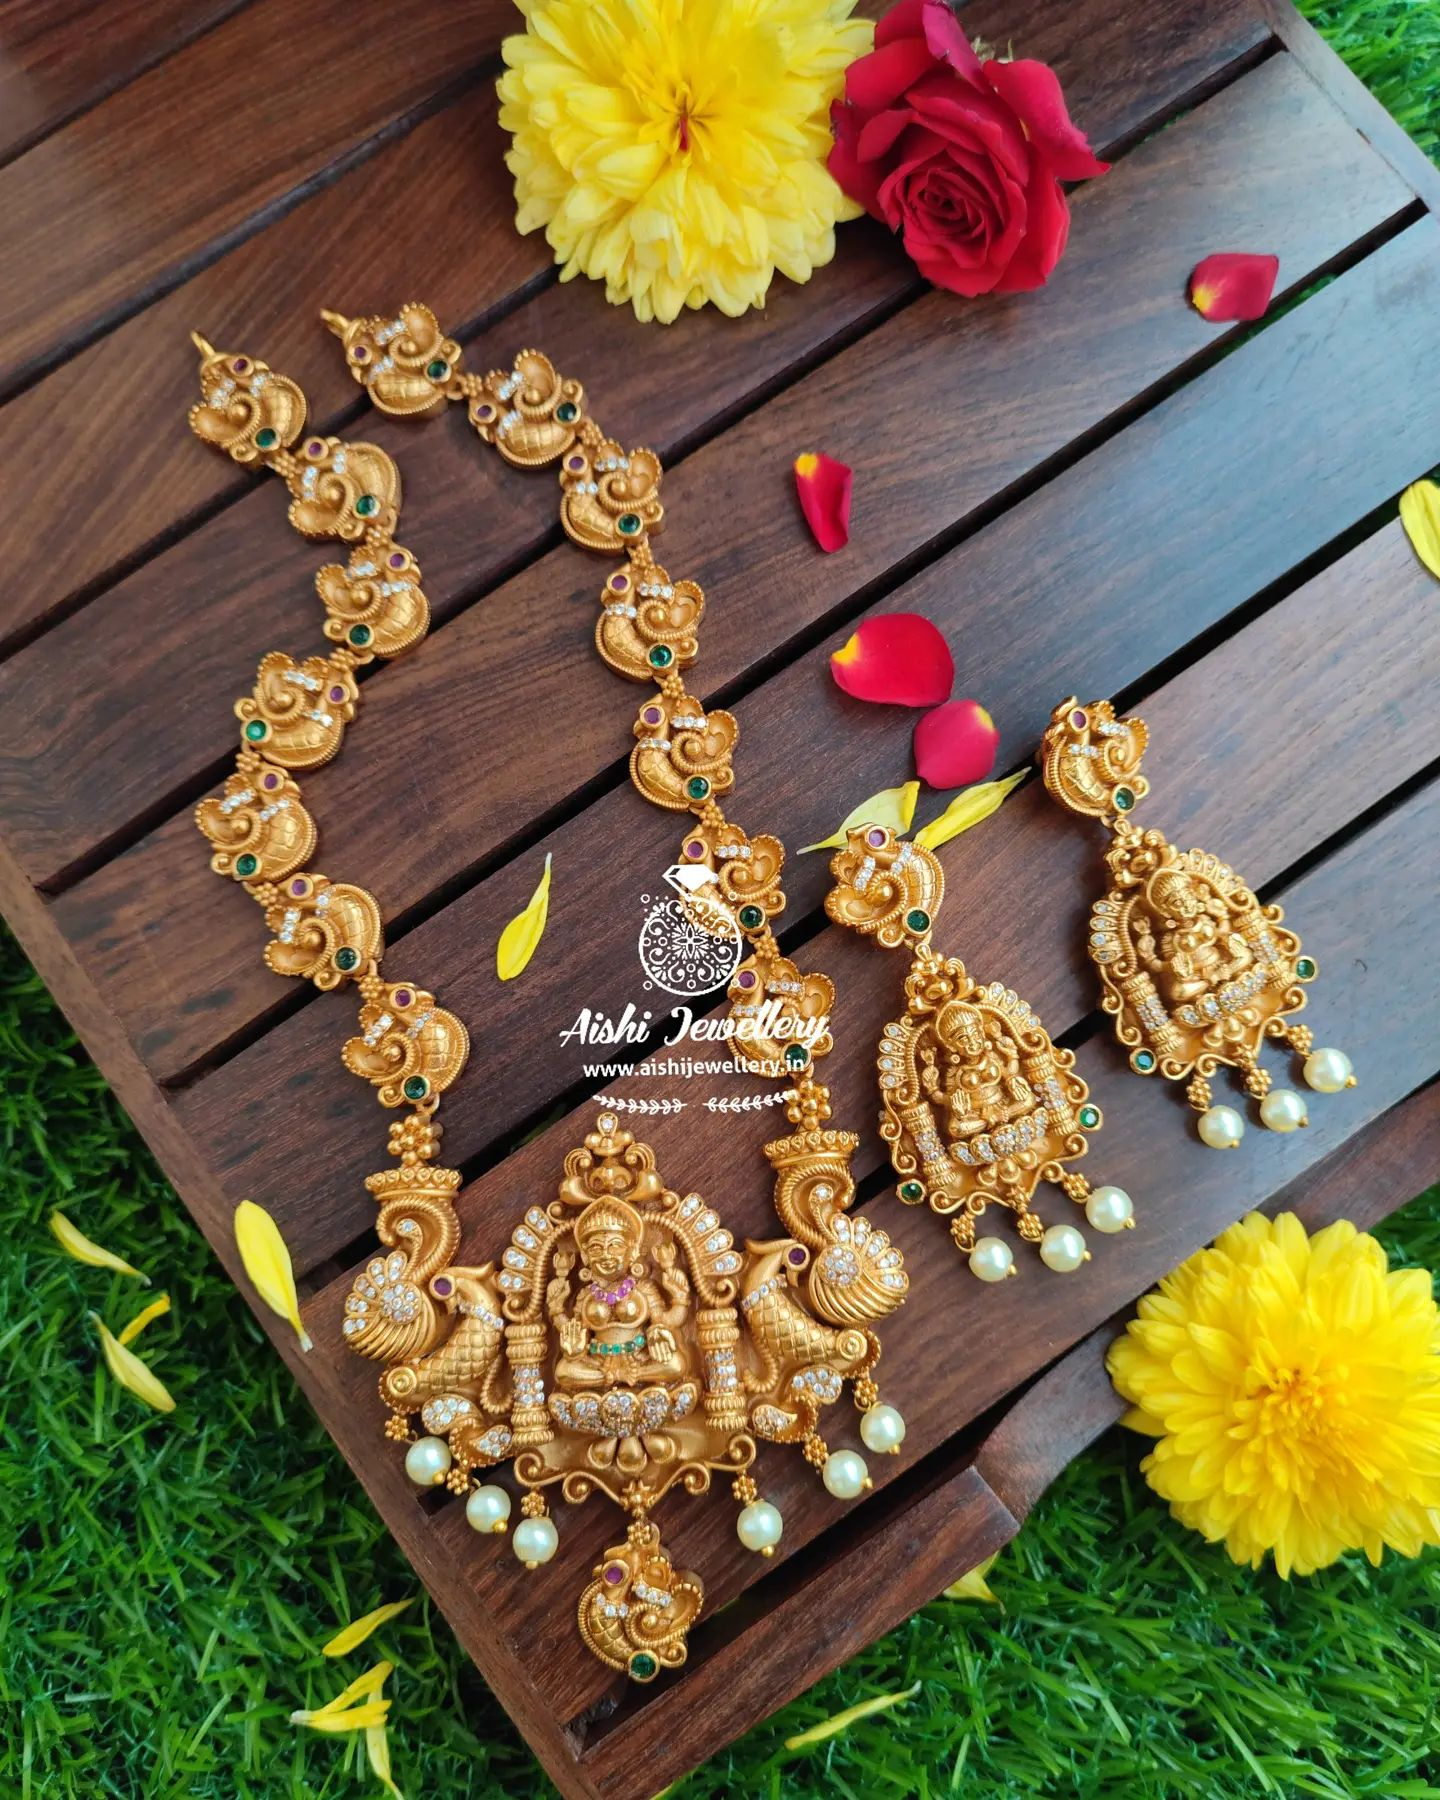 Beautiful one gram gold swan motifs long haaram with Lakshmi devi pendant and matching earrings. 1 gram jewellery set one gram gold jewellery with price 1 gram gold bridal jewellery sets with price